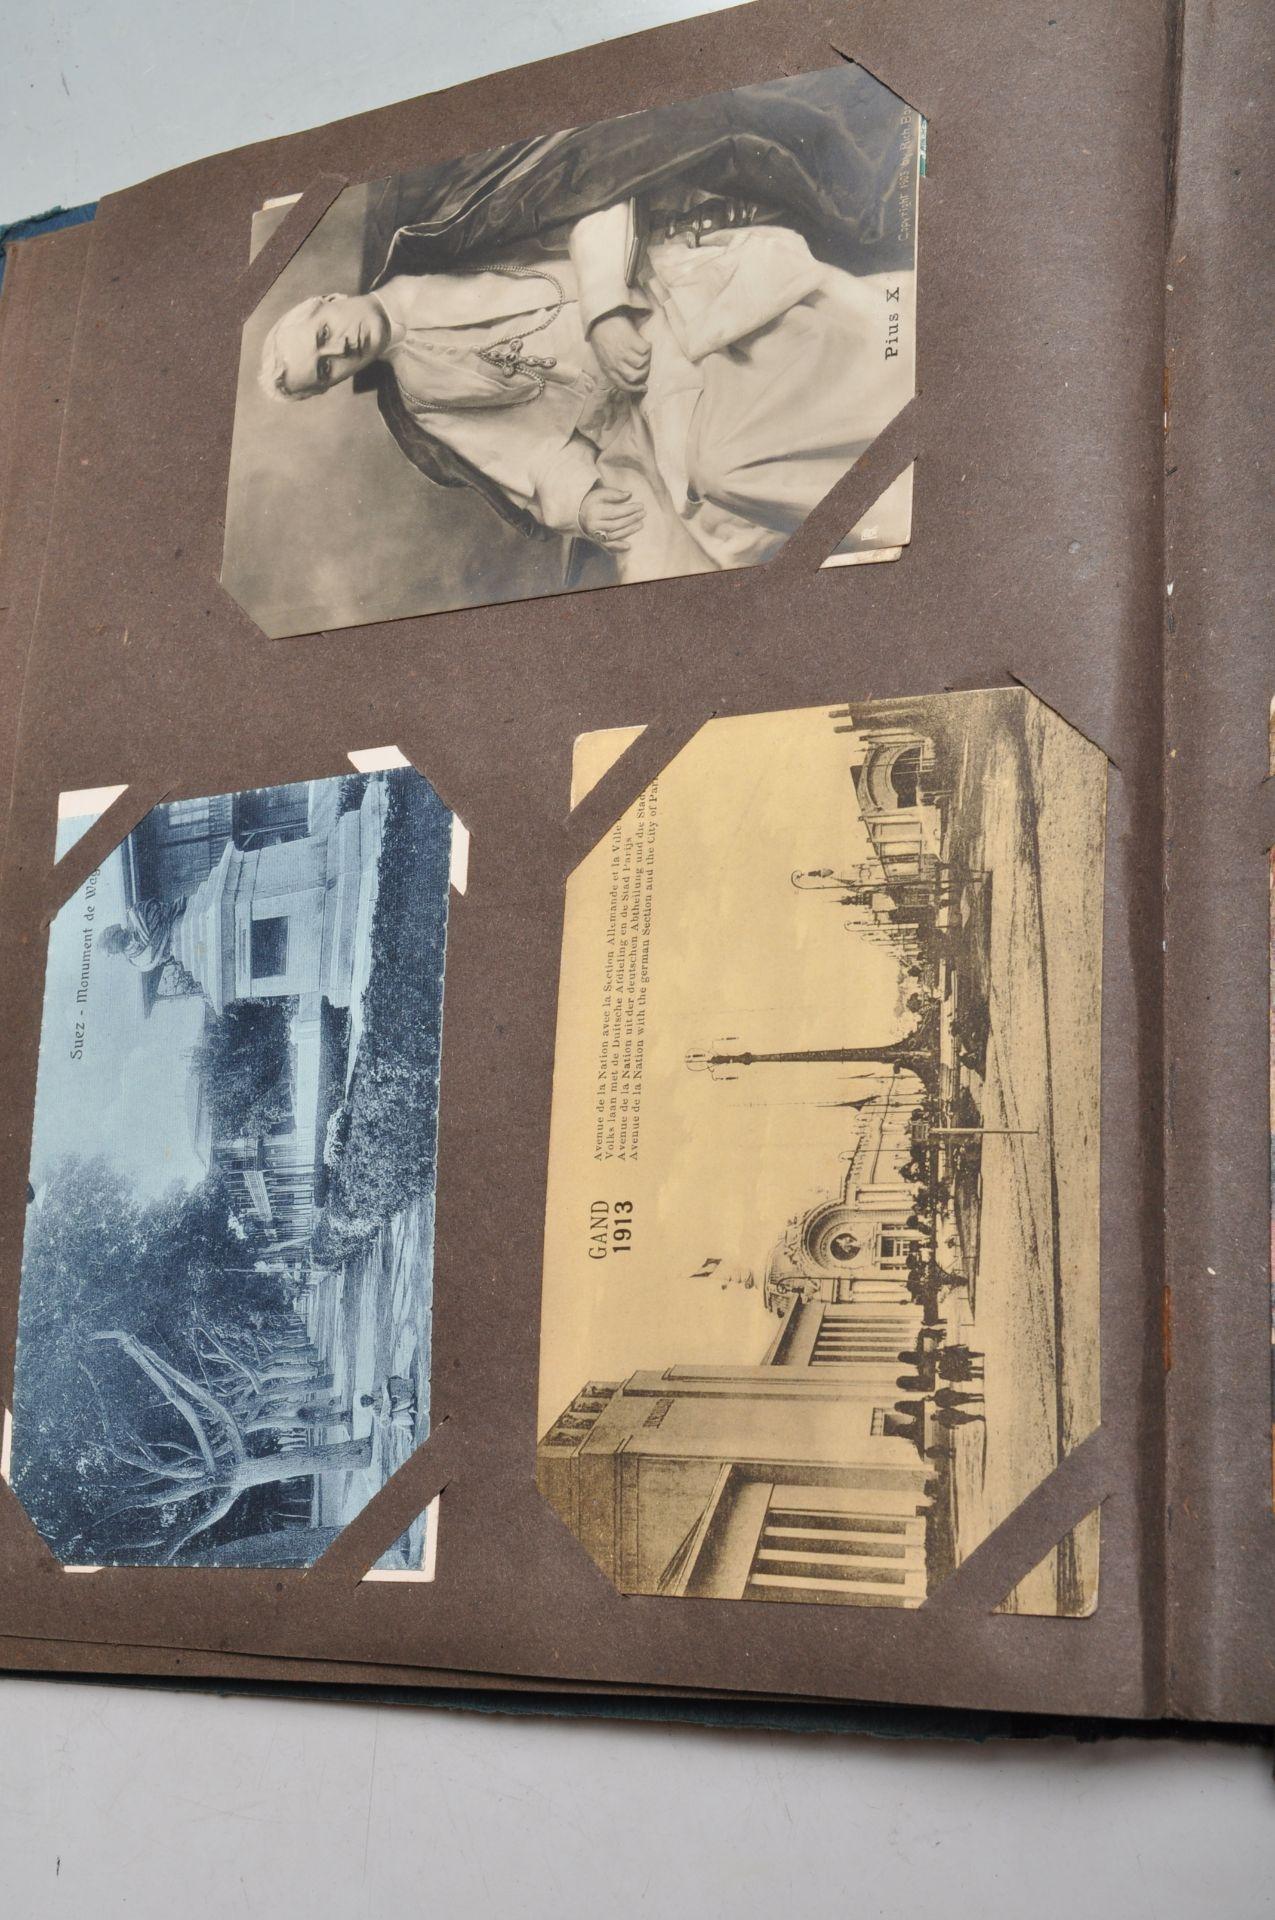 ALBUM OF FOREIGN POSTCARDS - ALL CIRCA WW1 PERIOD - Bild 15 aus 23